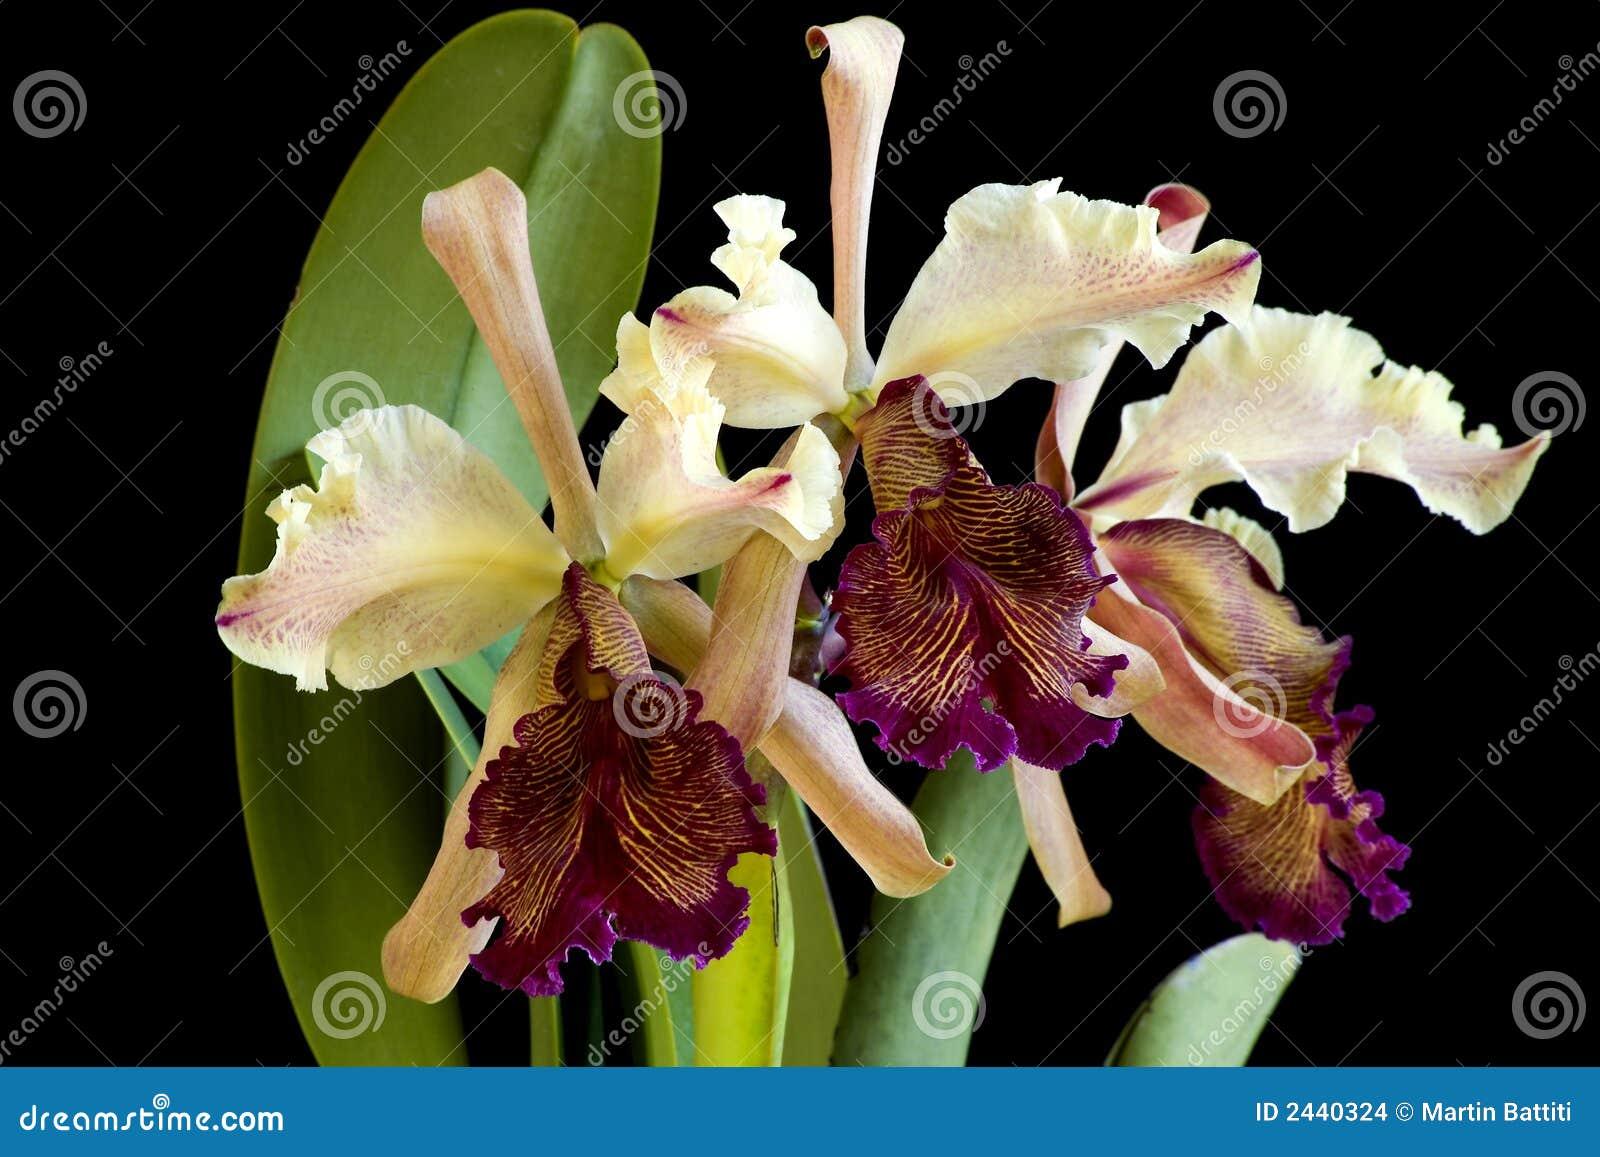 Dowiana Orchidee